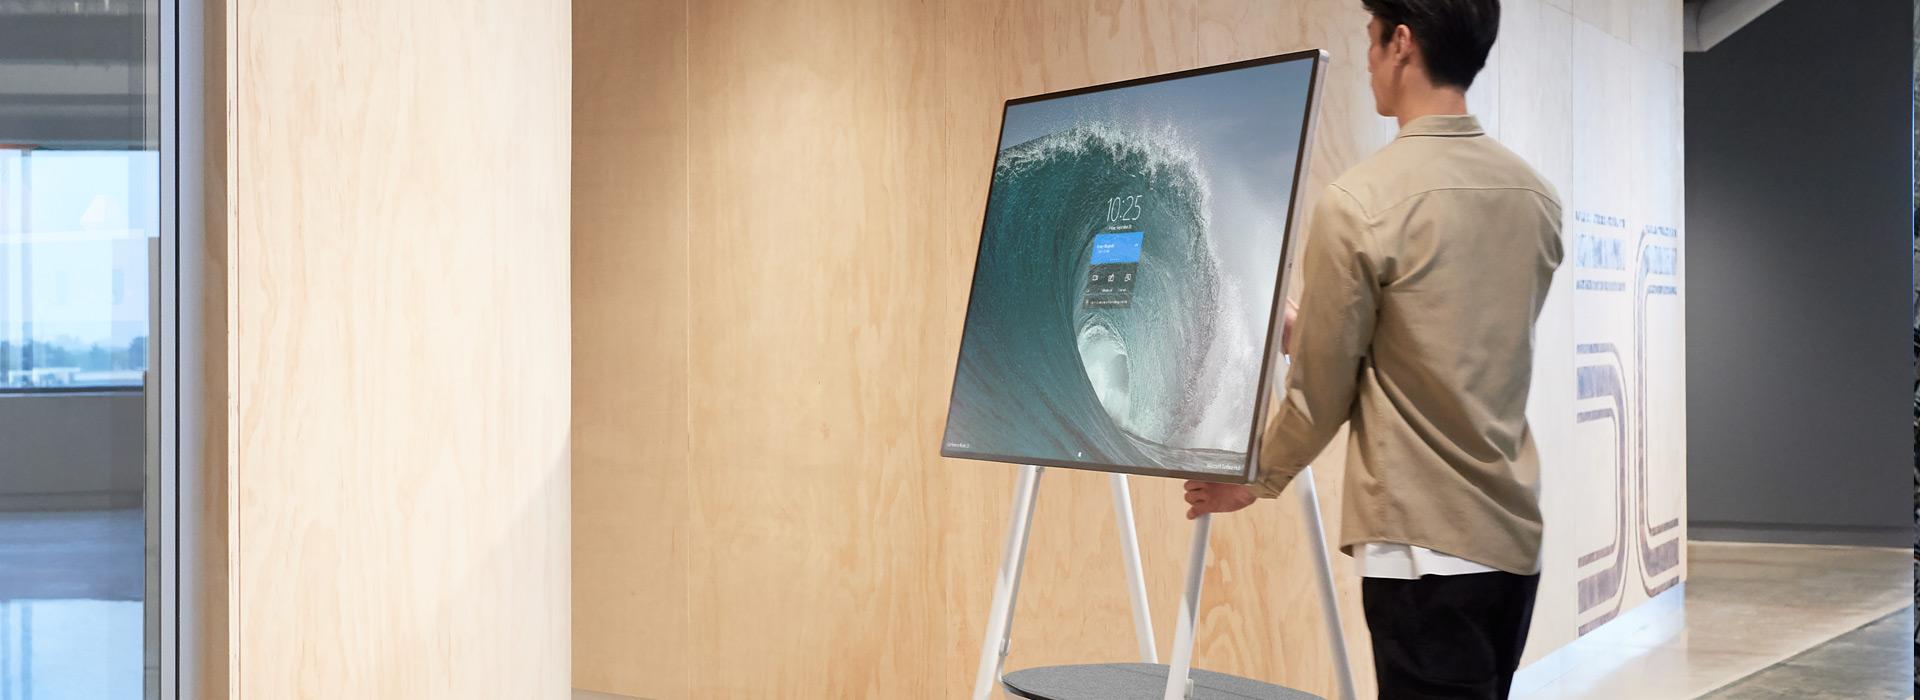 Un hombre transporta Surface Hub 2S en un soporte móvil